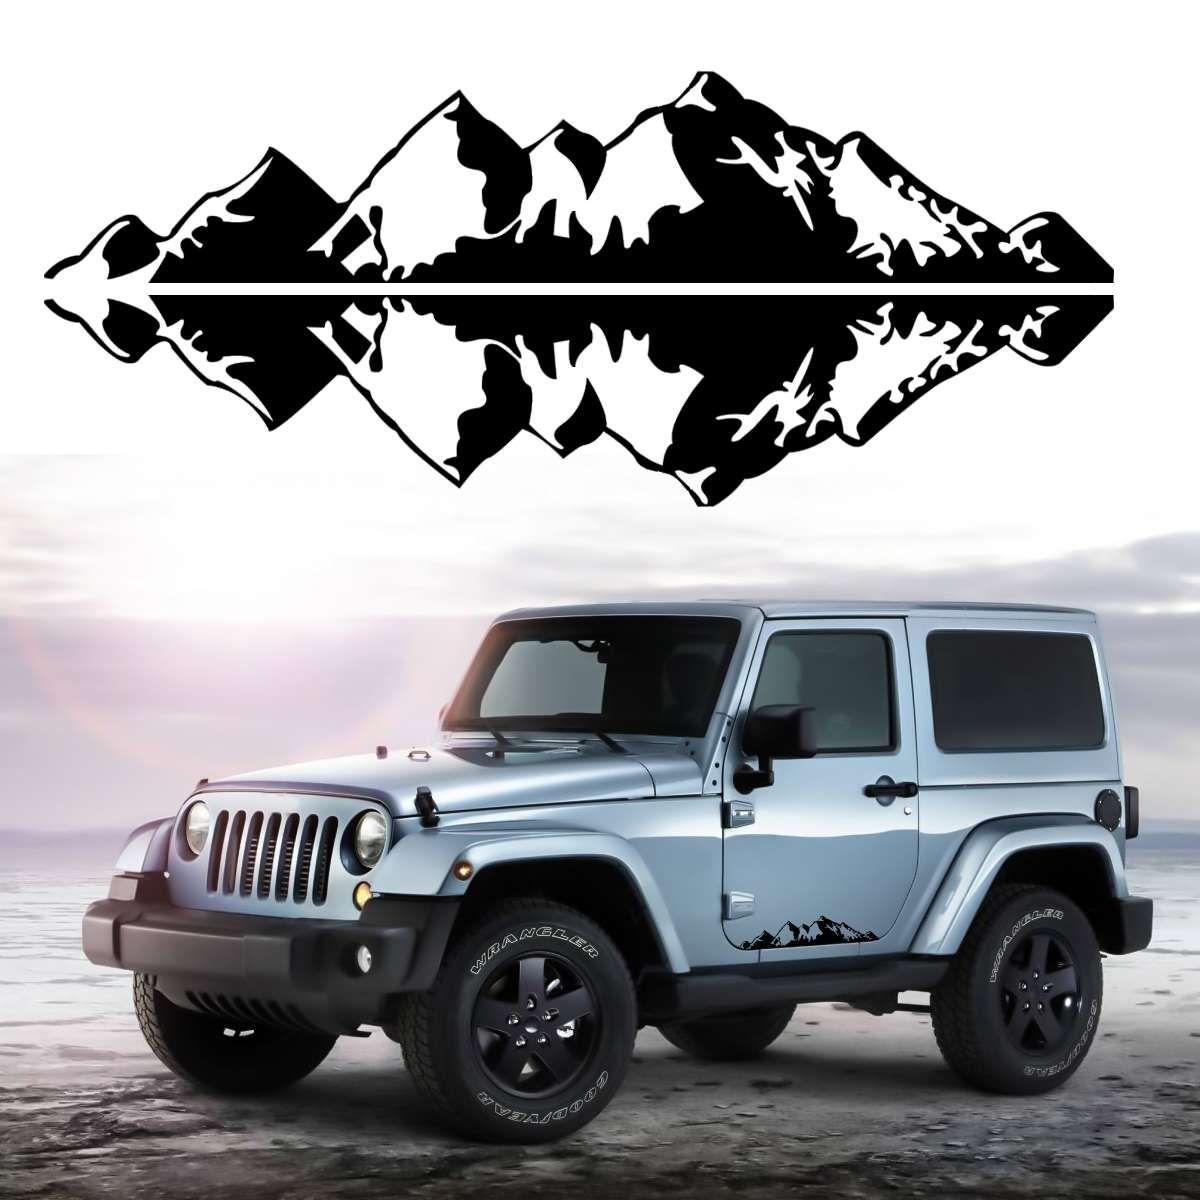 2019 universal car mountain range sticker vinyl decals sticker for jeep suv truck 76x 16 8cm 30x 6 6 white black from mingcar001 13 19 dhgate com